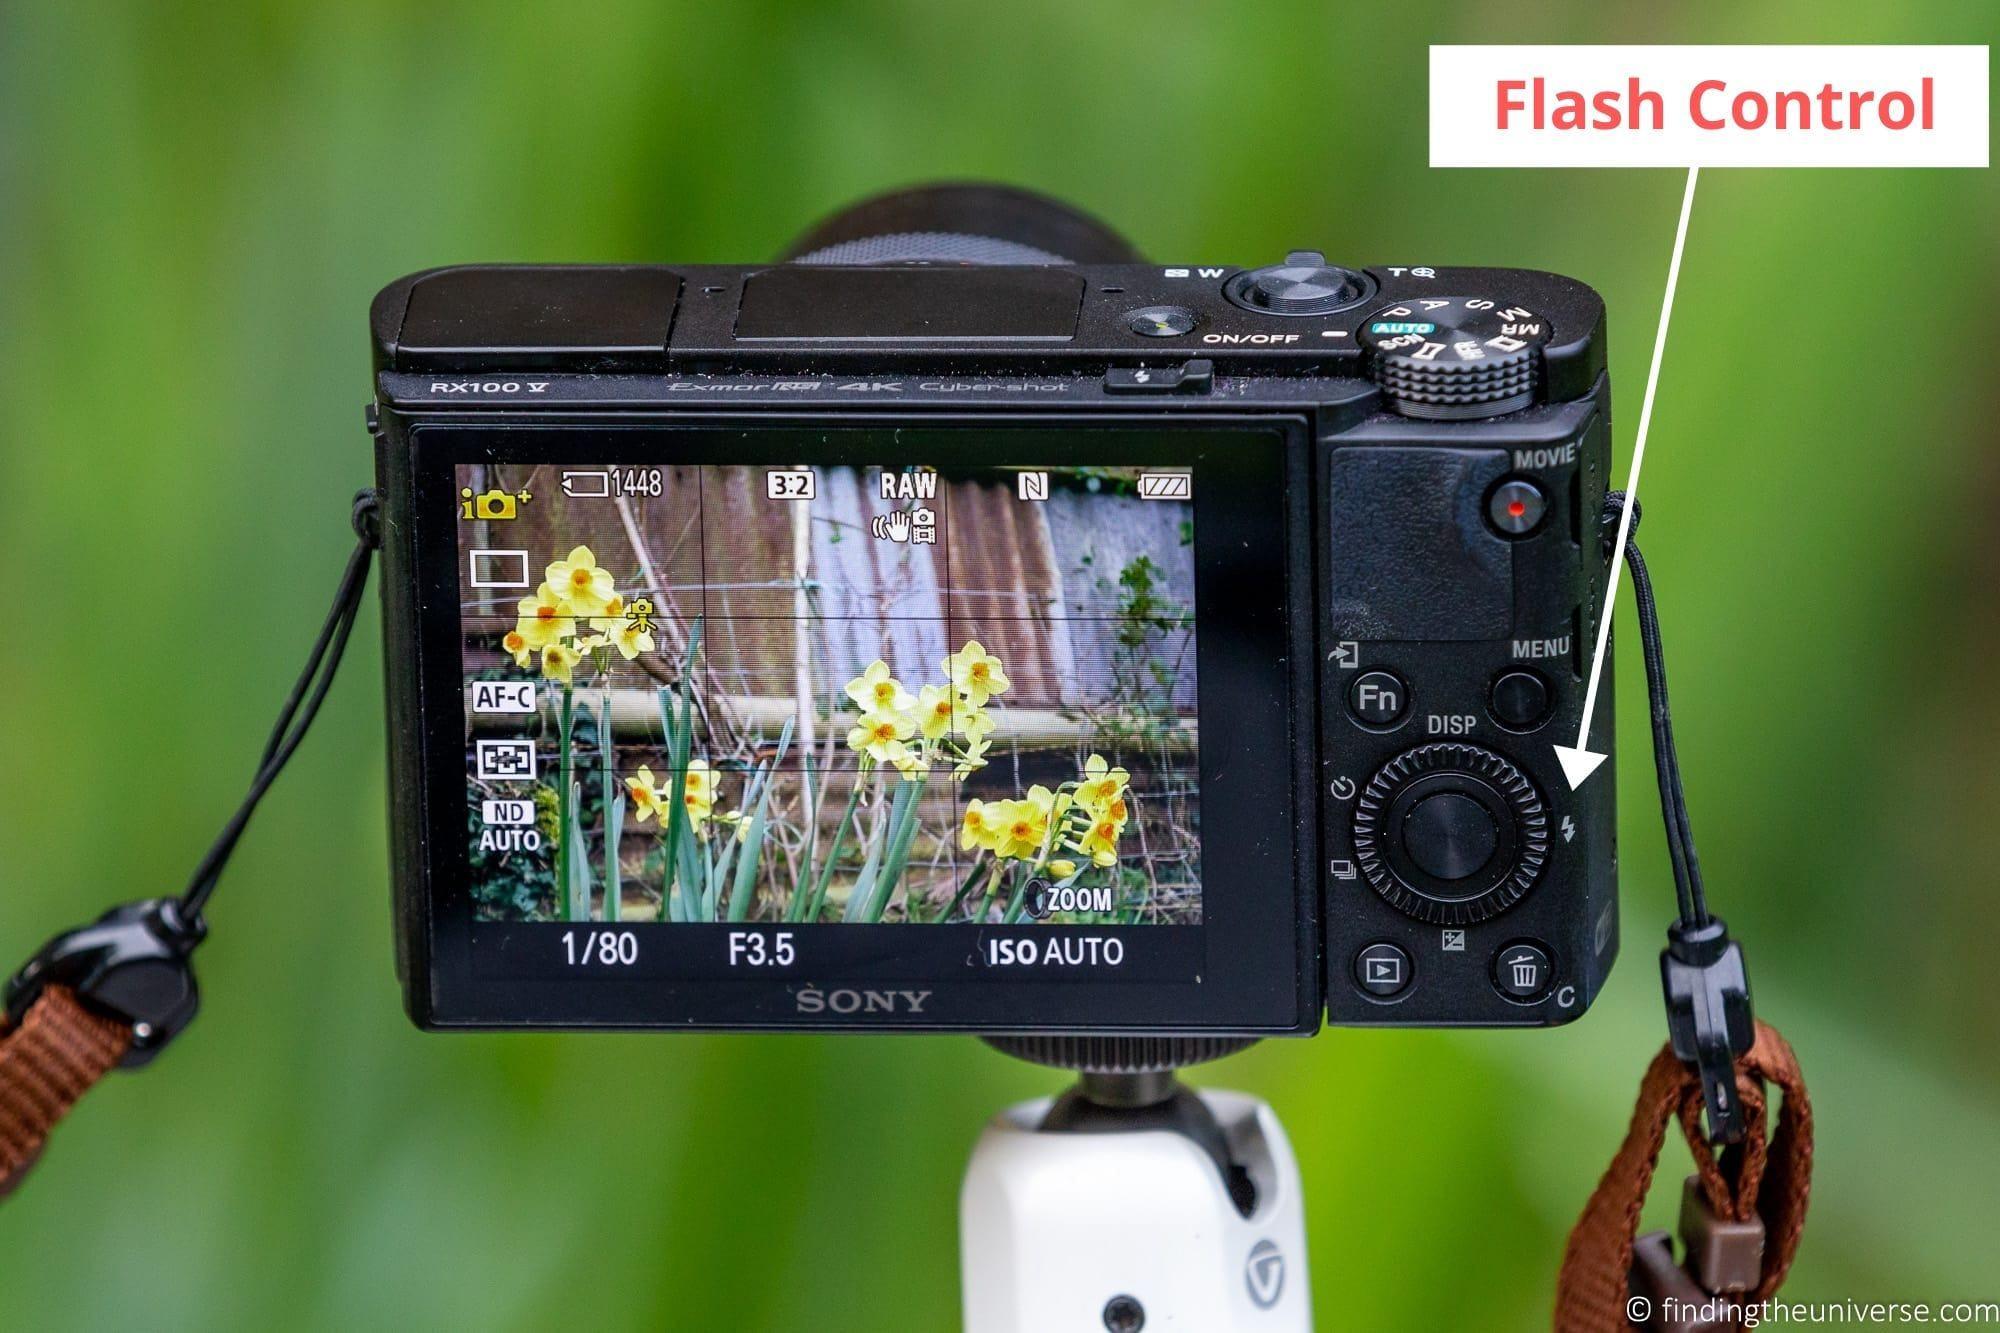 Flash Control Compact Camera